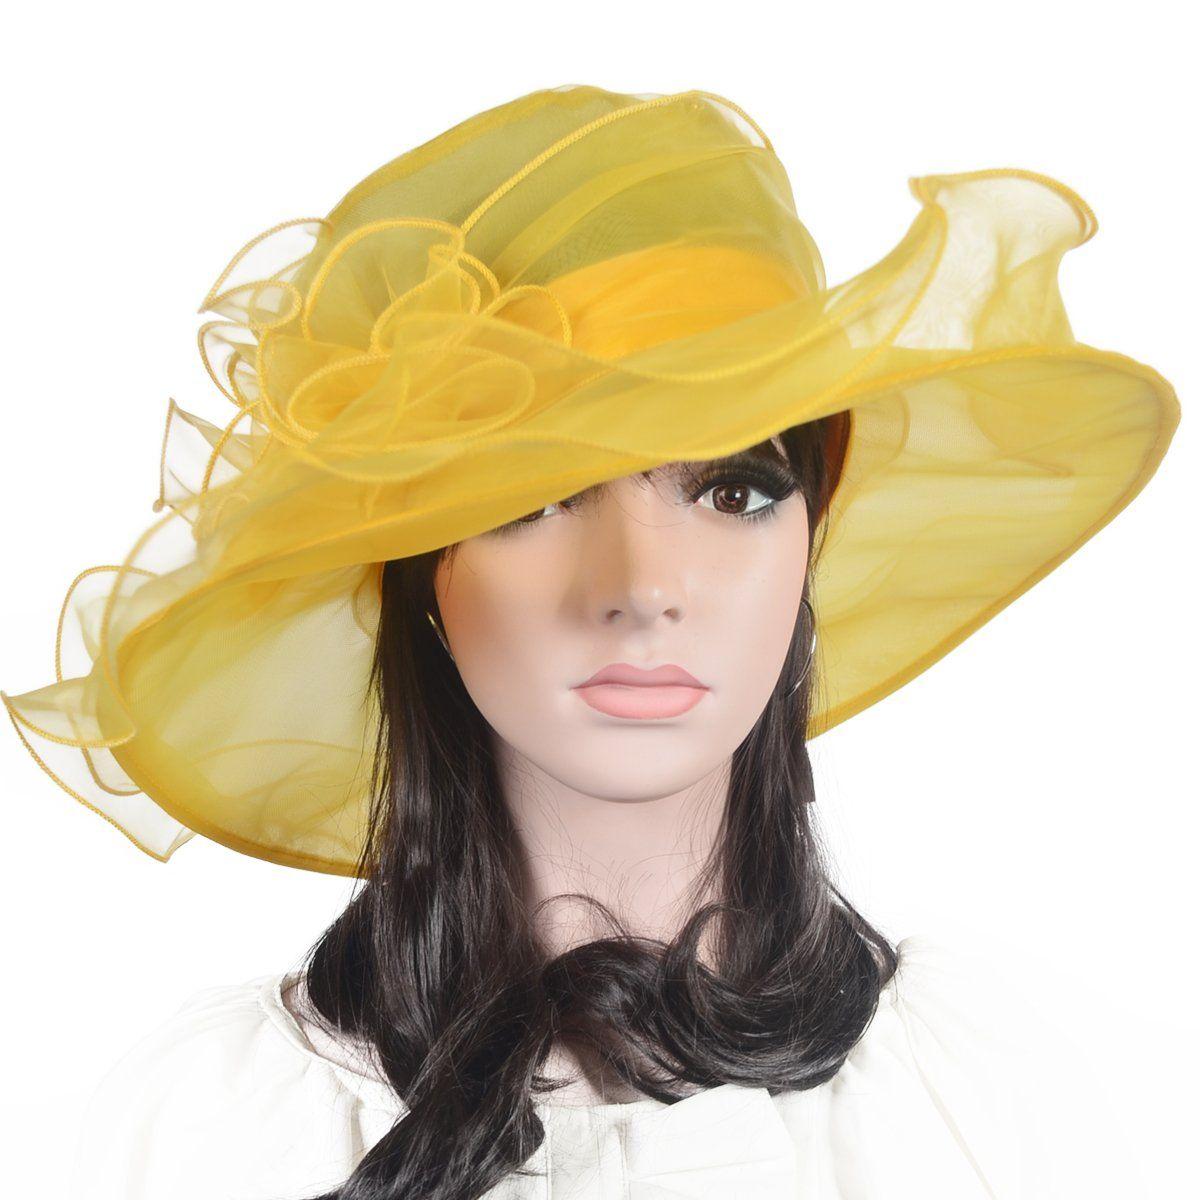 8cb45597bdf Lady Yellow Dress Hat Floral Kentucky Derby Sheer Wide Brim Hat ...